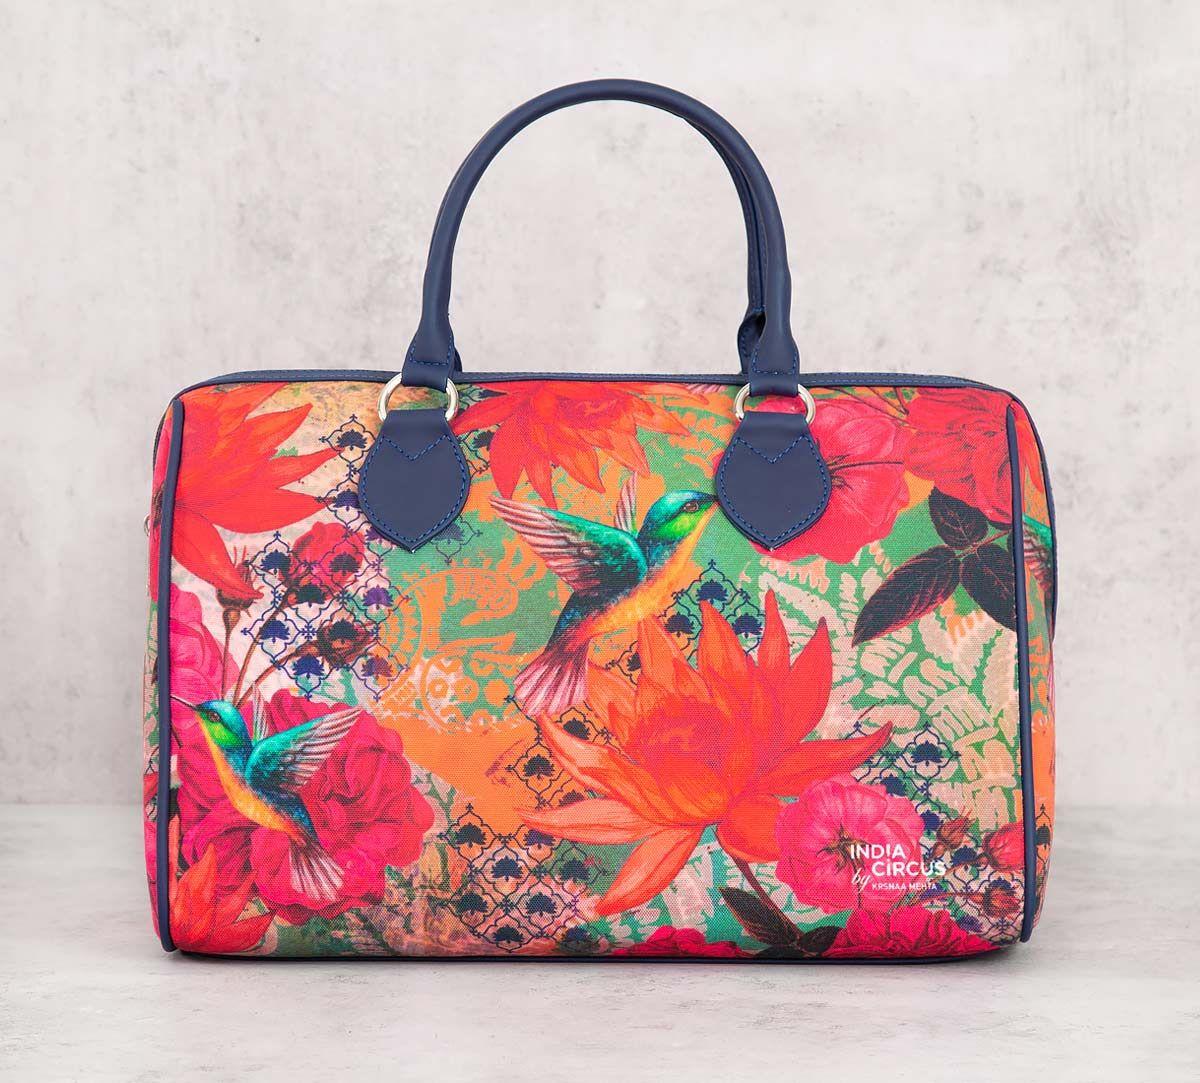 India Circus Floral Kingdom Duffle Bag